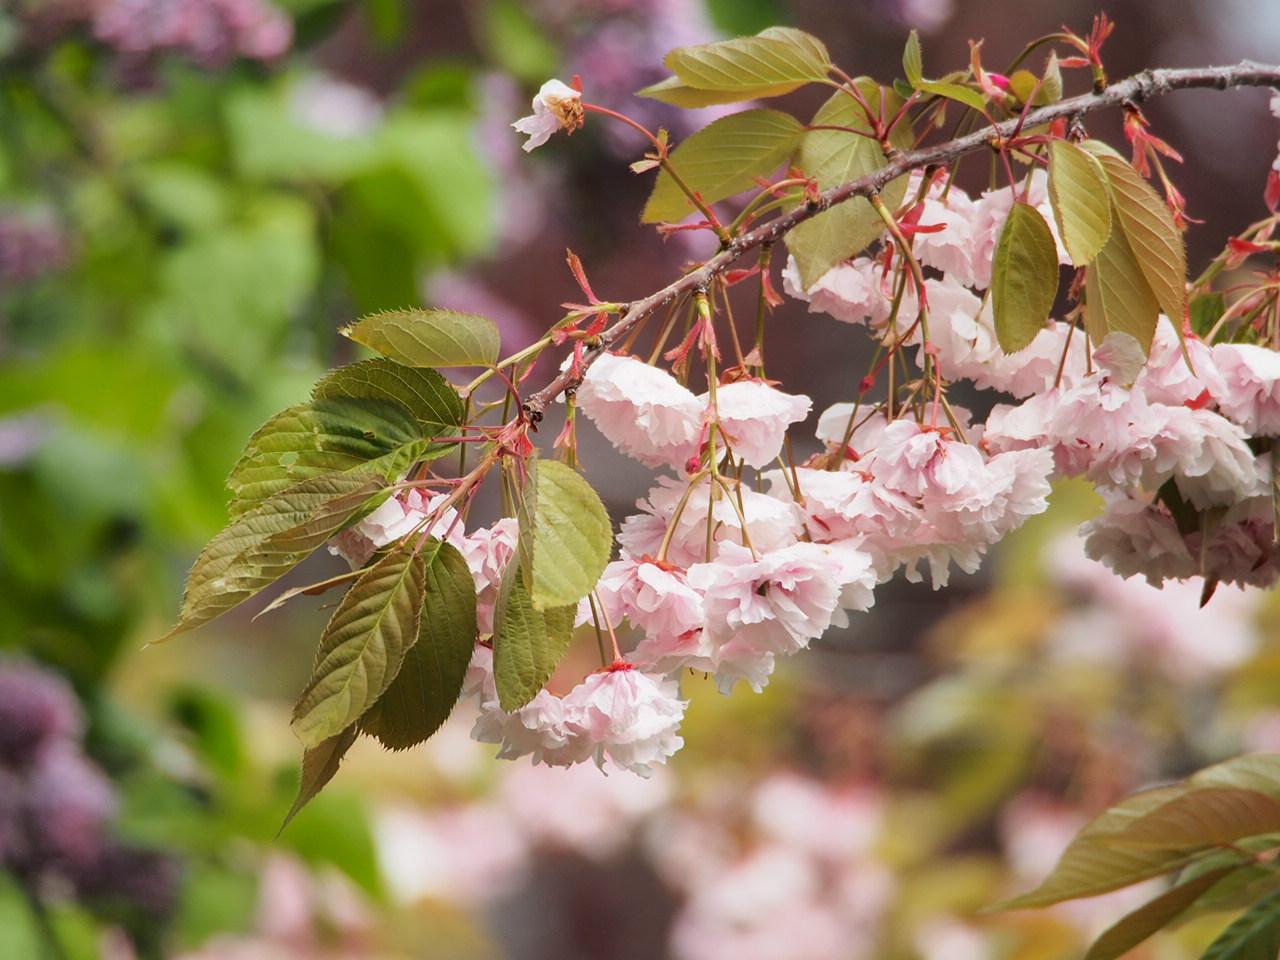 Cherry blossom on 18th Ave NE, Seattle, WA in 2017.